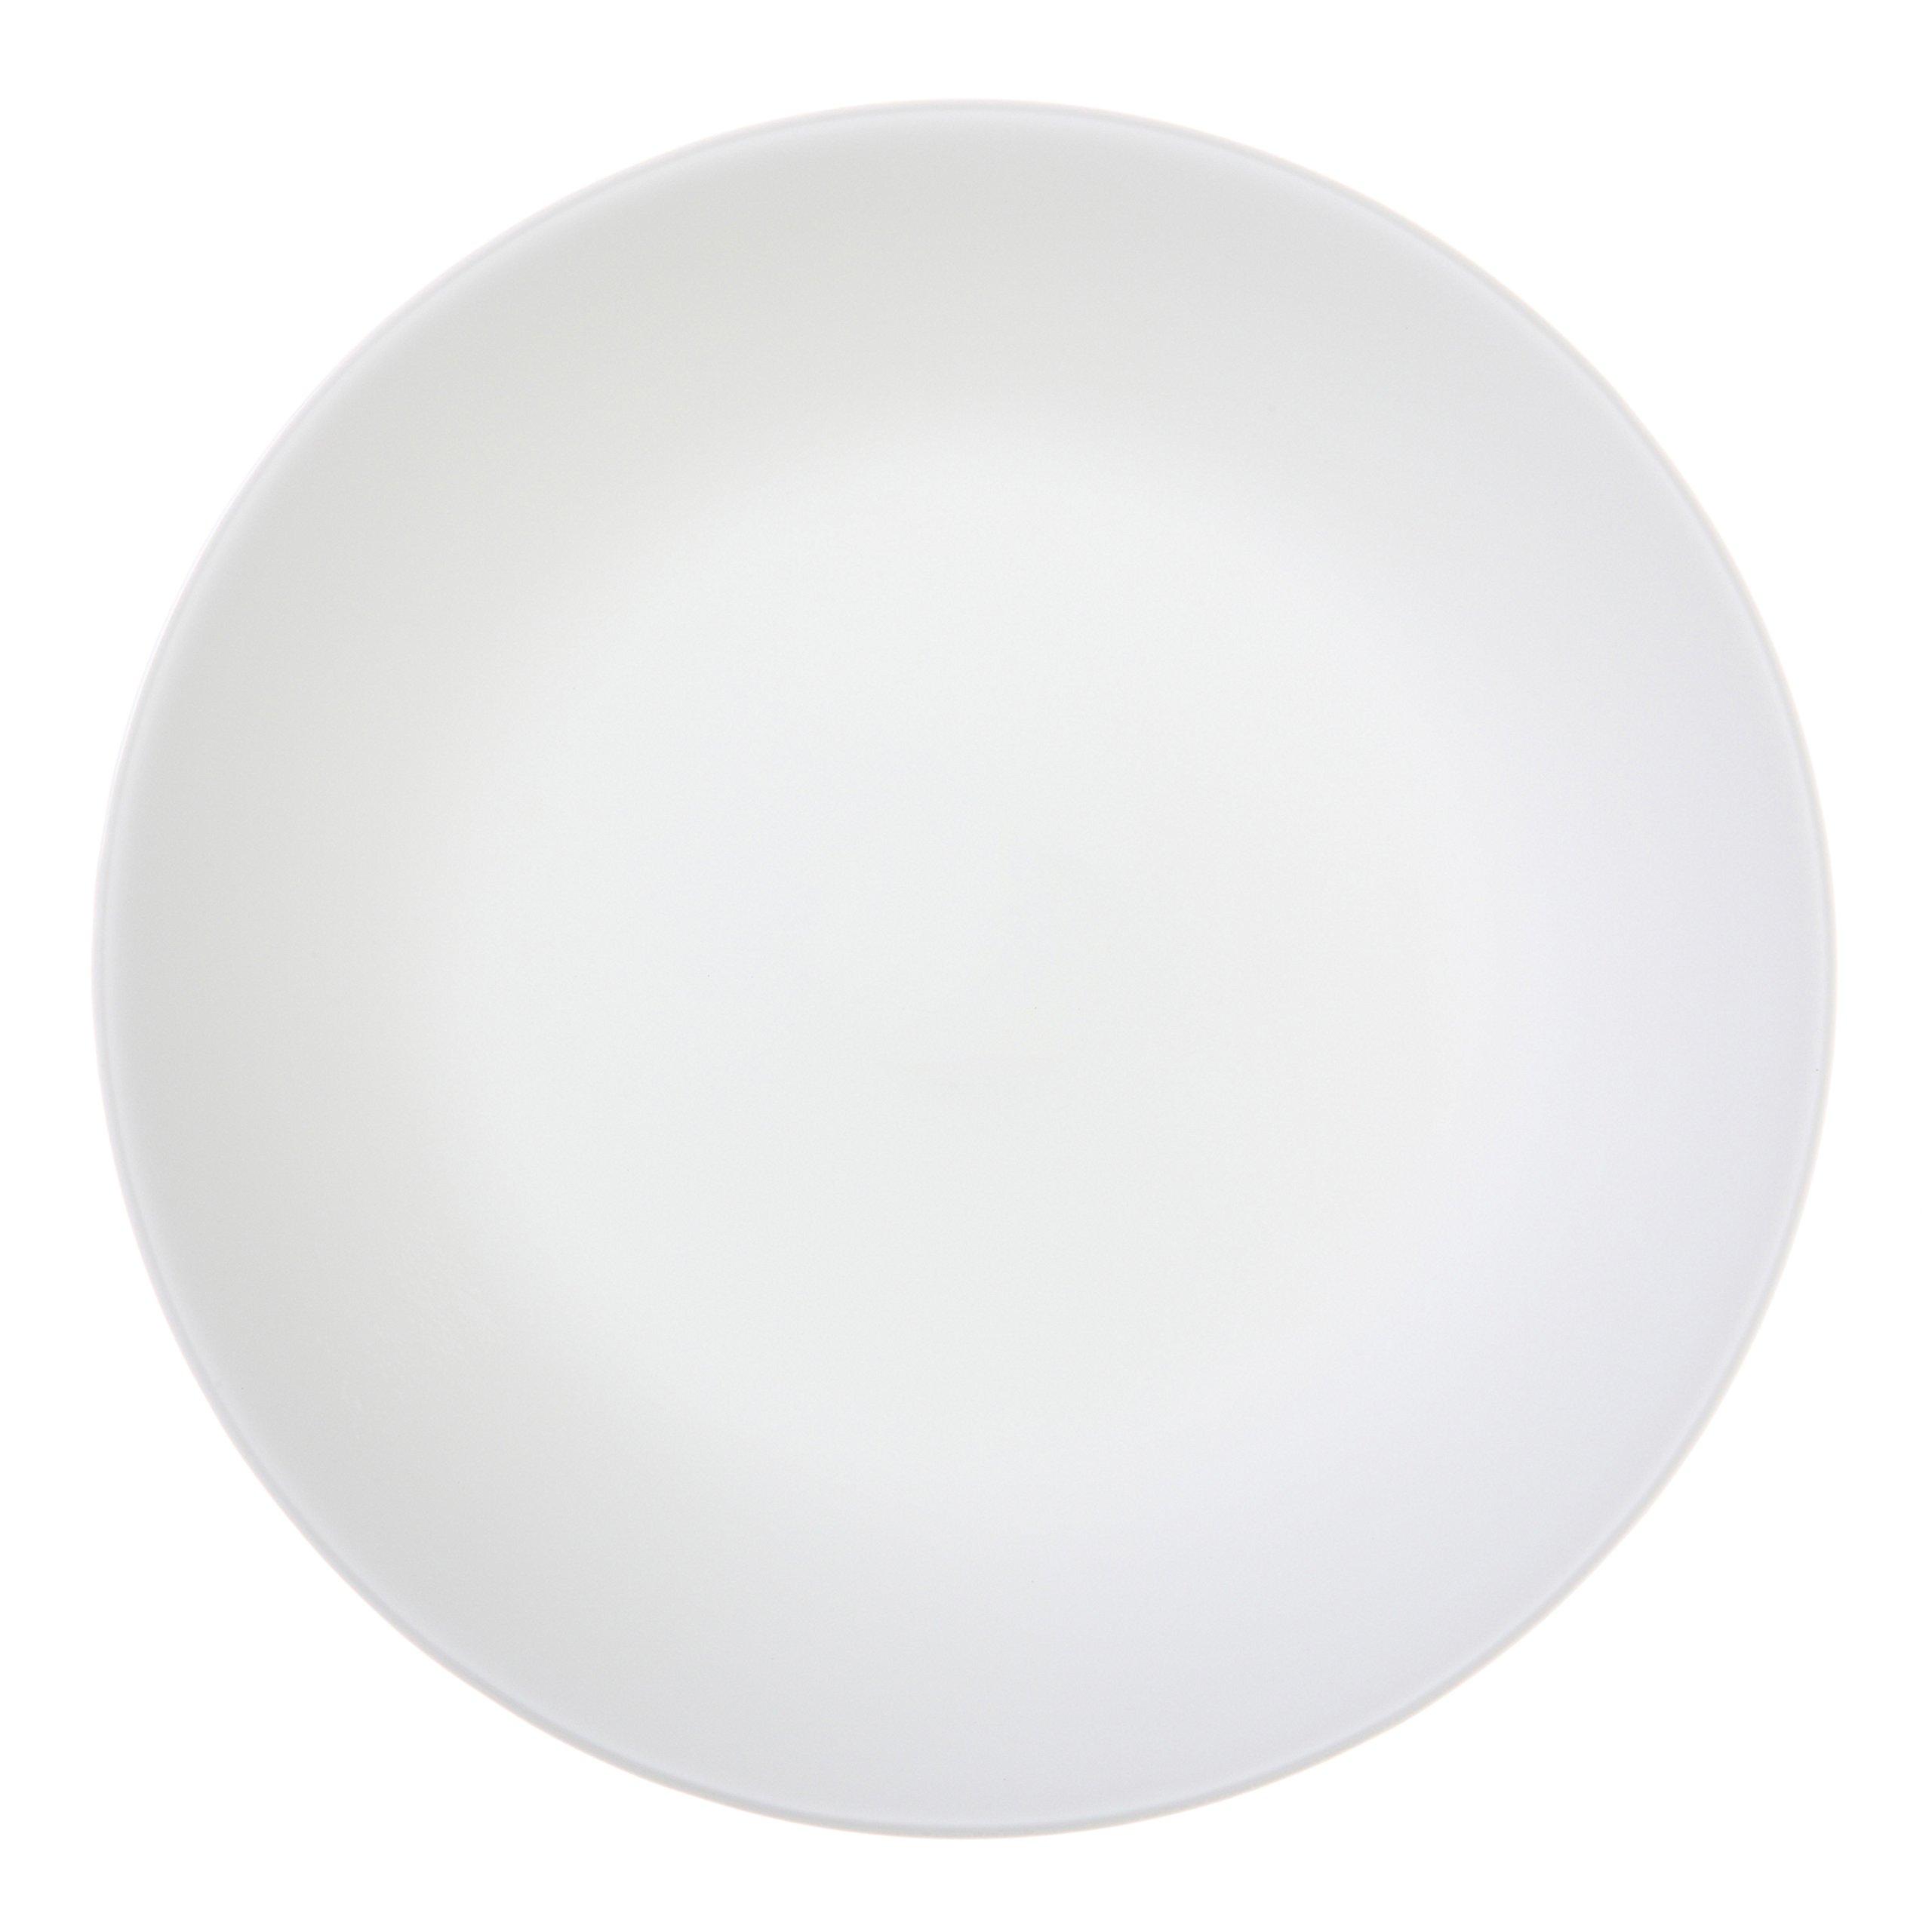 Corelle Winter Frost White 6-3/4-Inch Plate Set (6-Piece) by Corelle